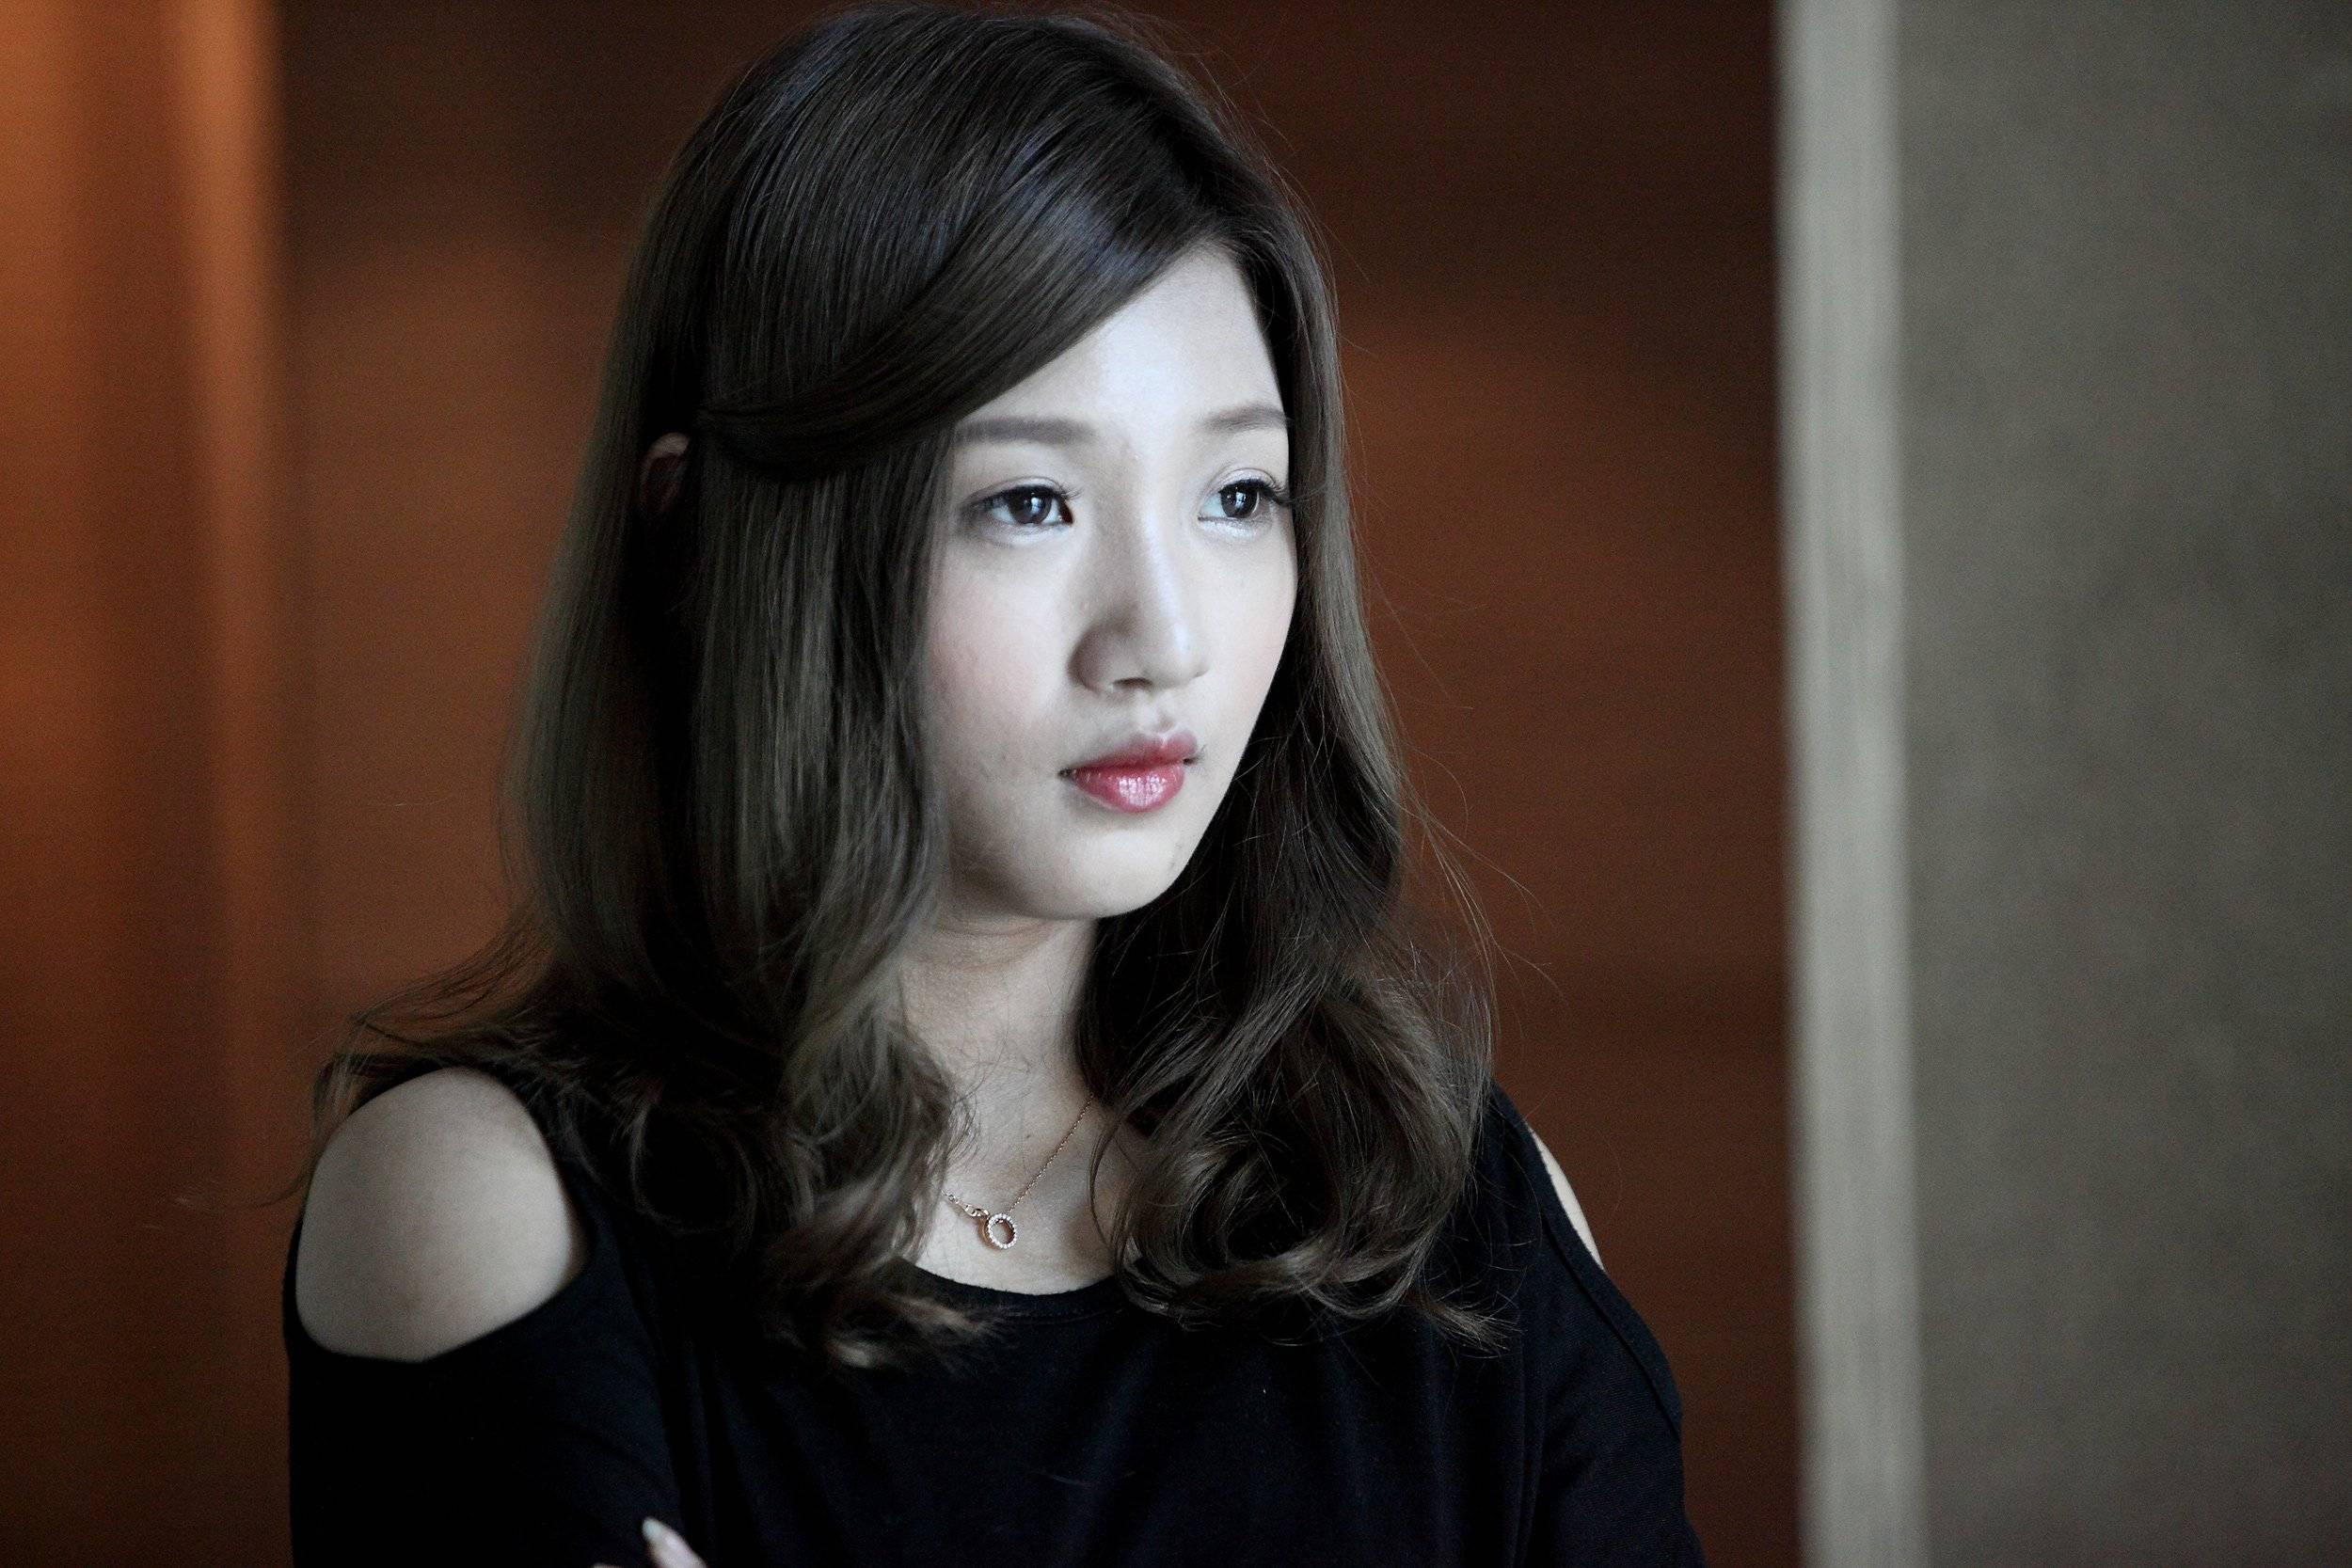 Young Mother 3 (Korean Movie - 2015) - 젊은 엄마3 @ HanCinema :: The